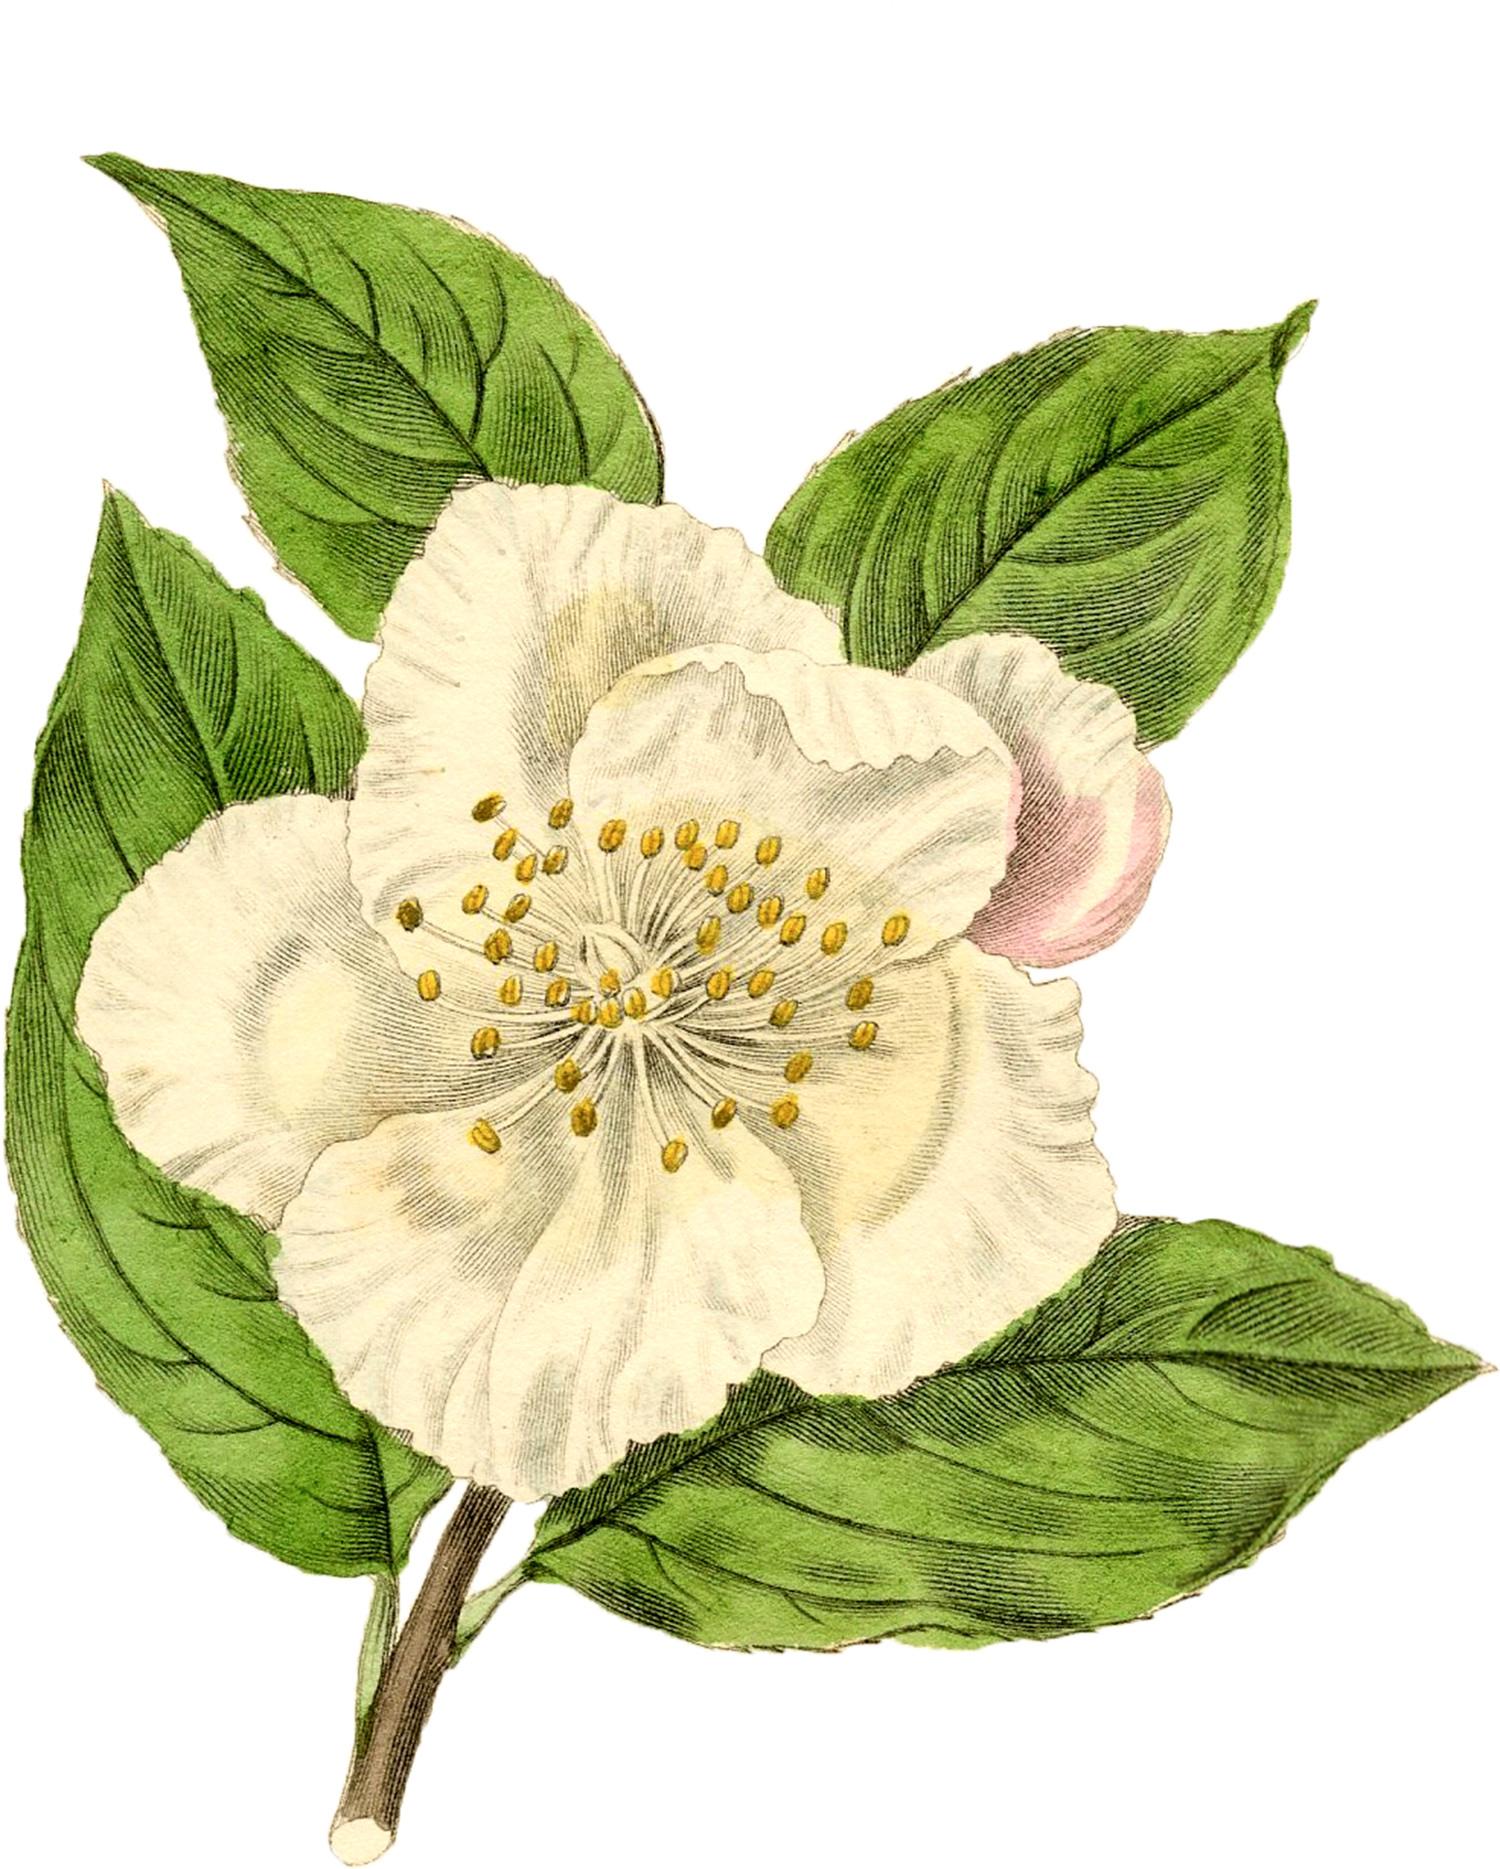 белый цветок шиповника